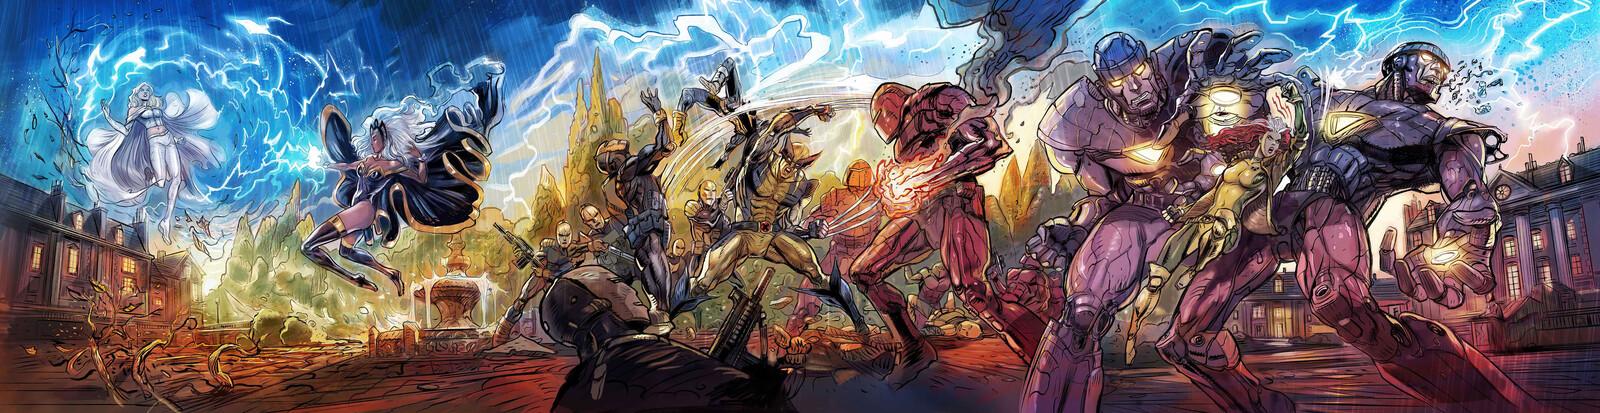 X-Men - Mutant Insurrection: Emma Frost Showdown (3 panels)